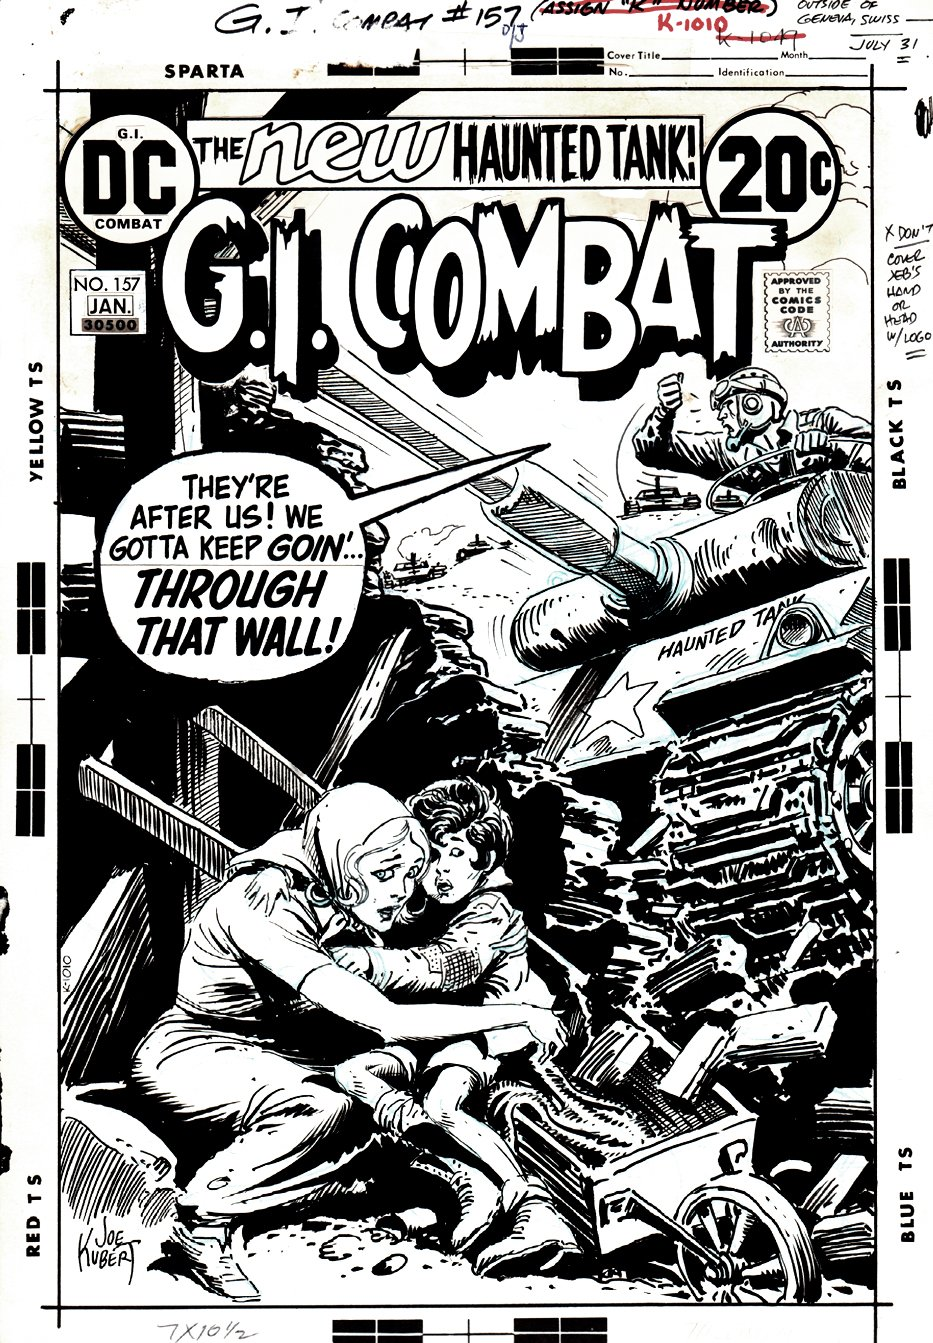 G.I. Combat #157 Cover (HAUNTED TANK!) 1972